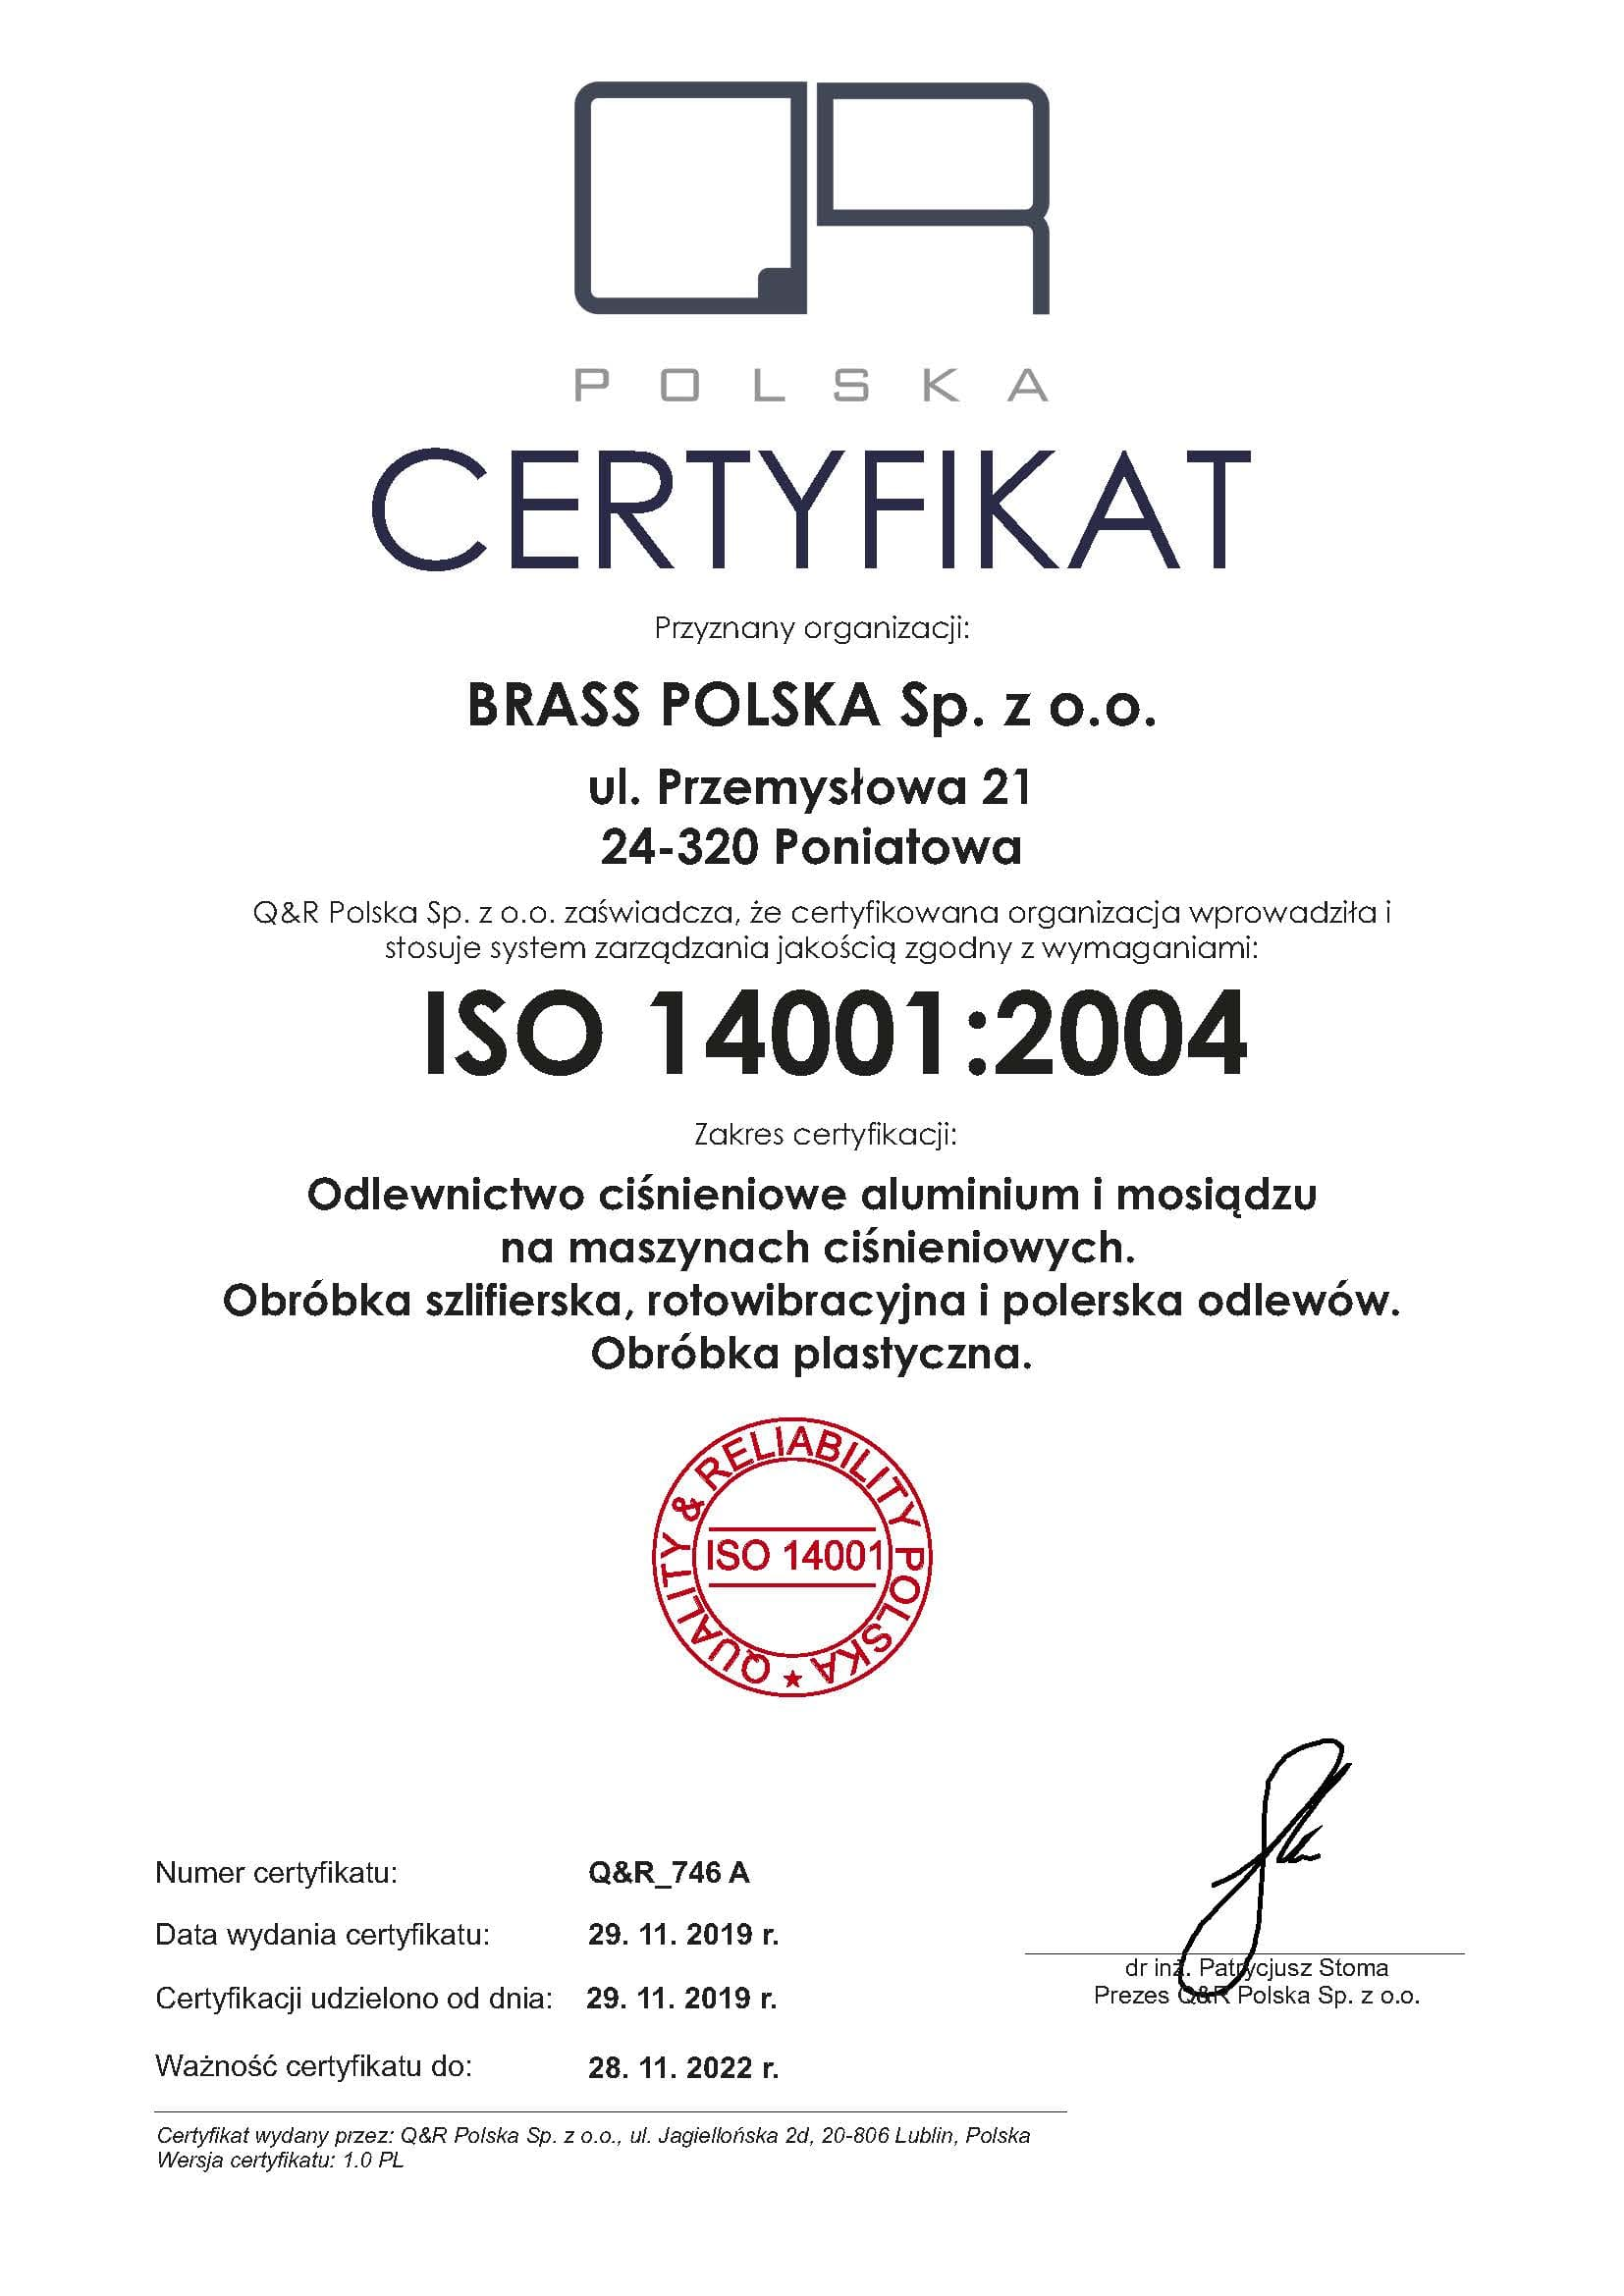 certyfikat QR_746 A pl 14001 ver 1.0